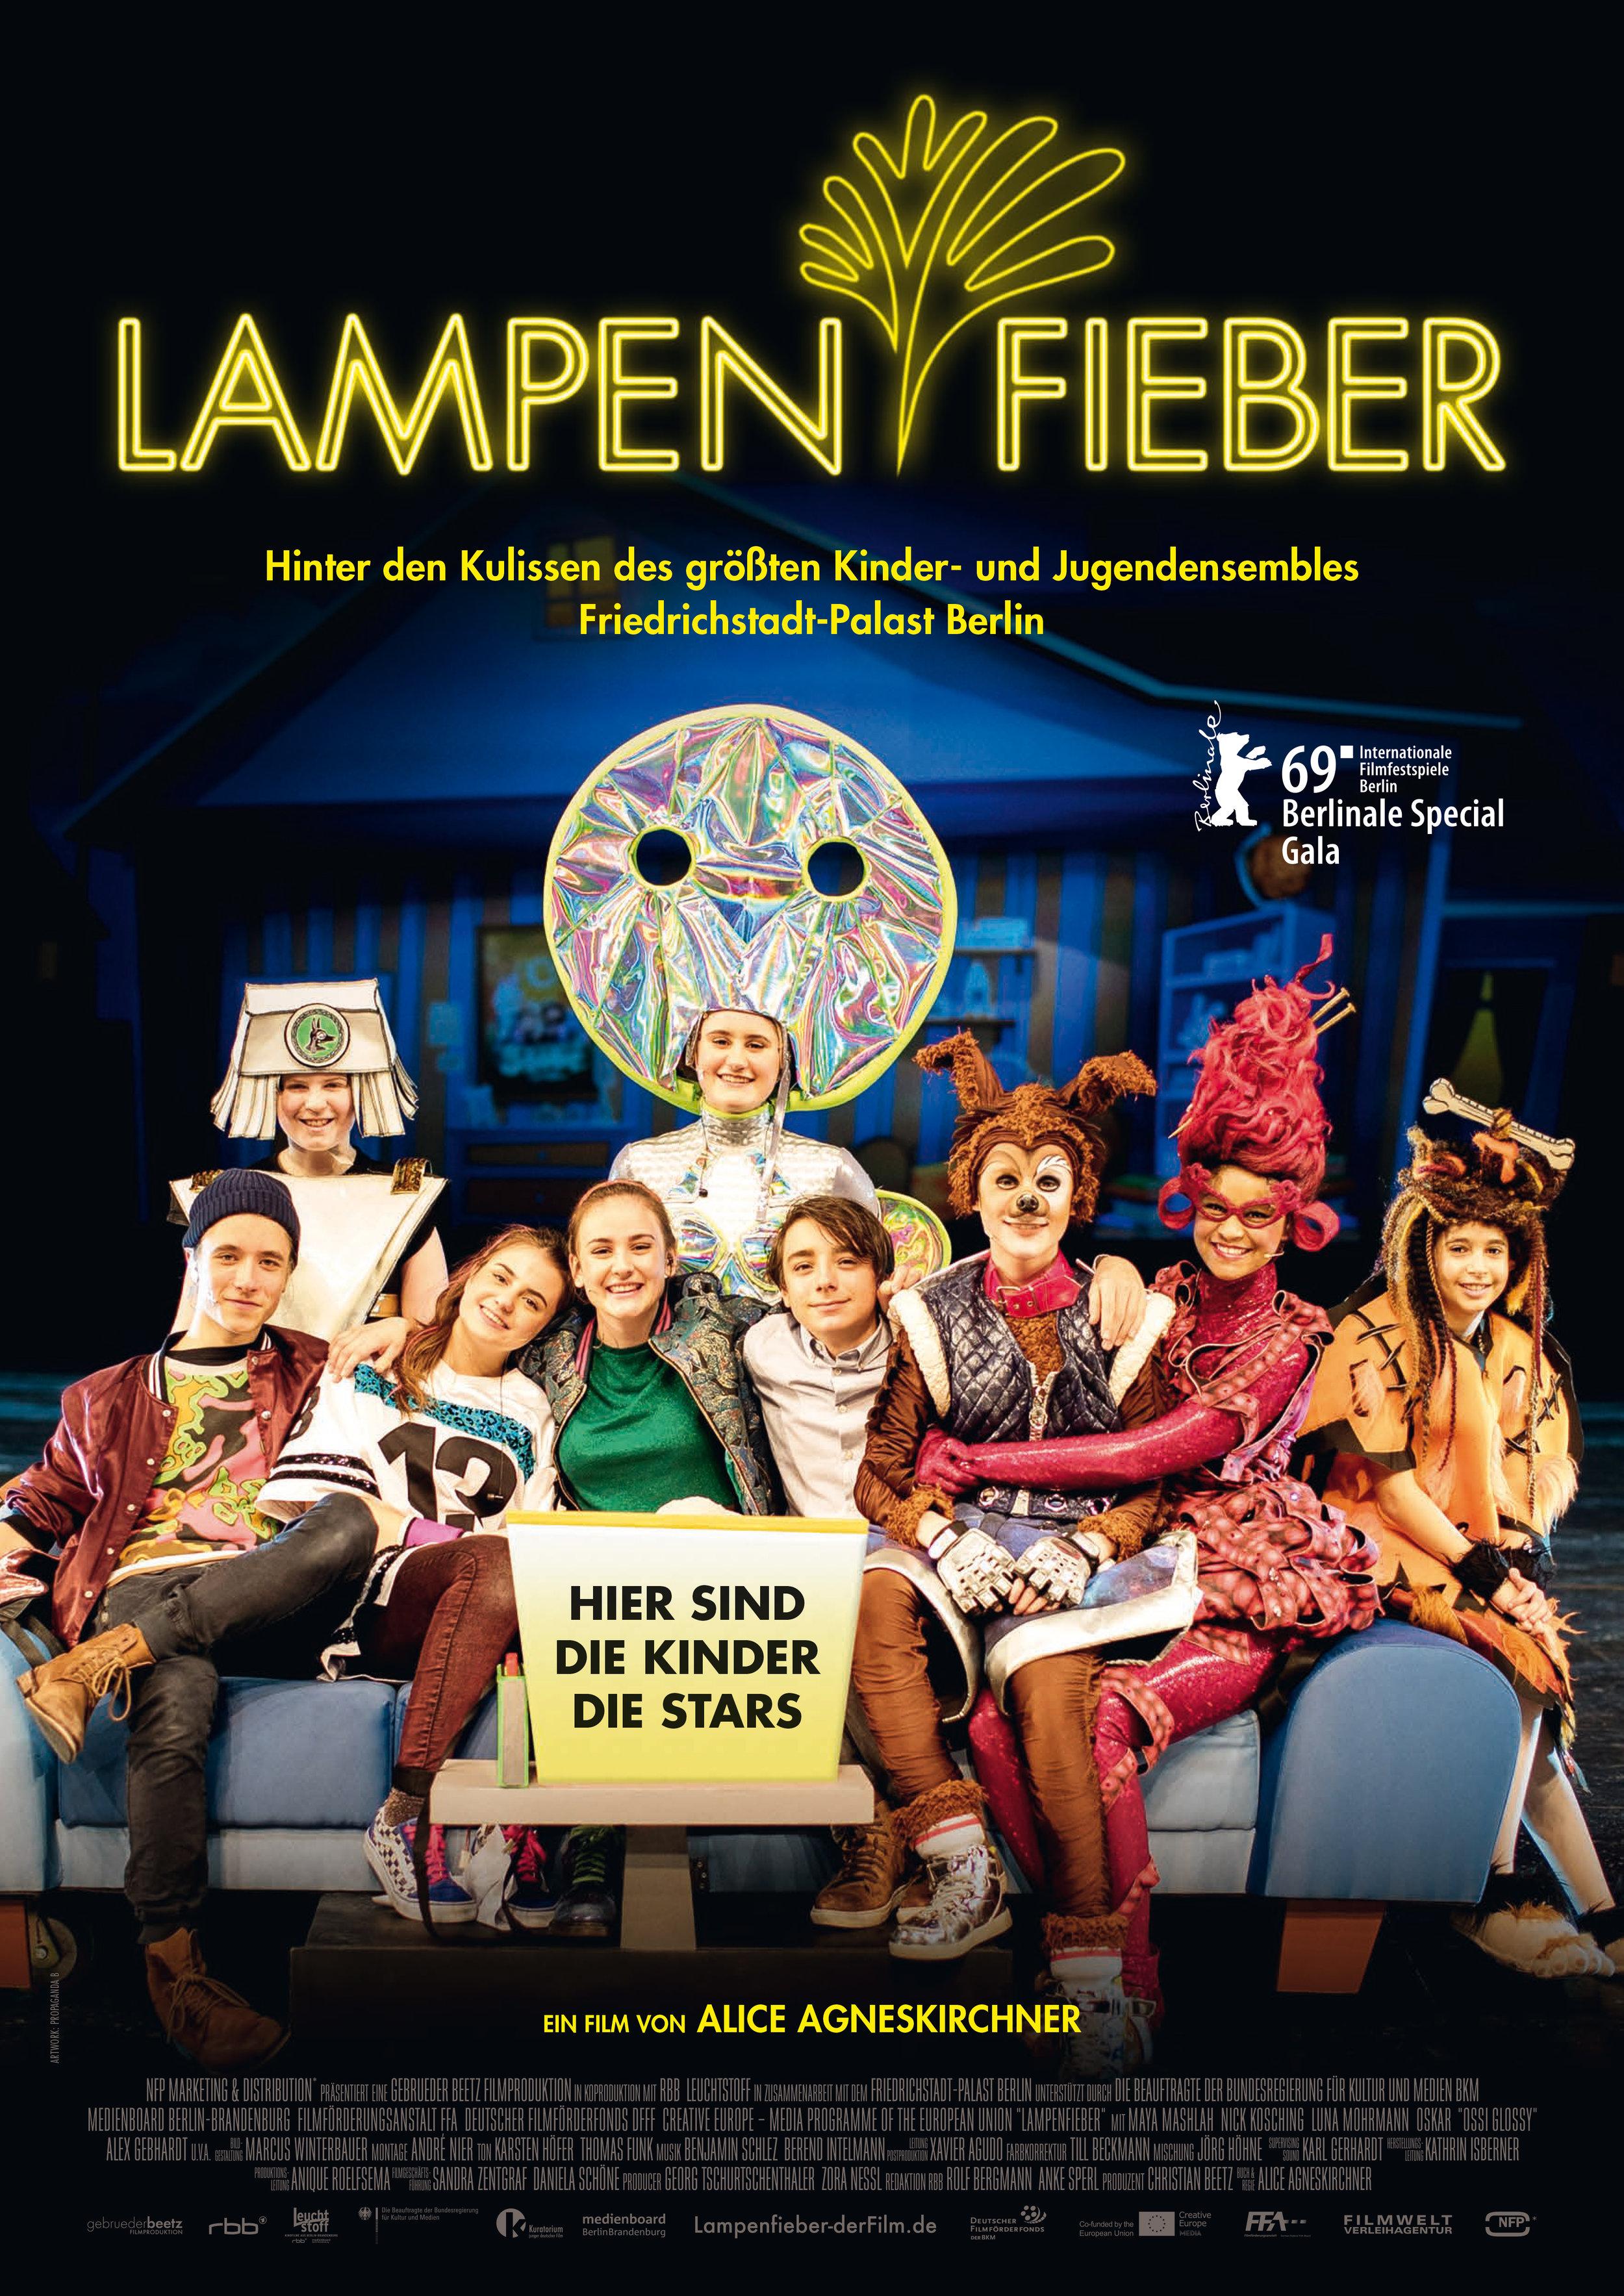 PLAKAT_LAMPENFIEBER_2018_gebrueder-beetz-filmproduktion.jpg